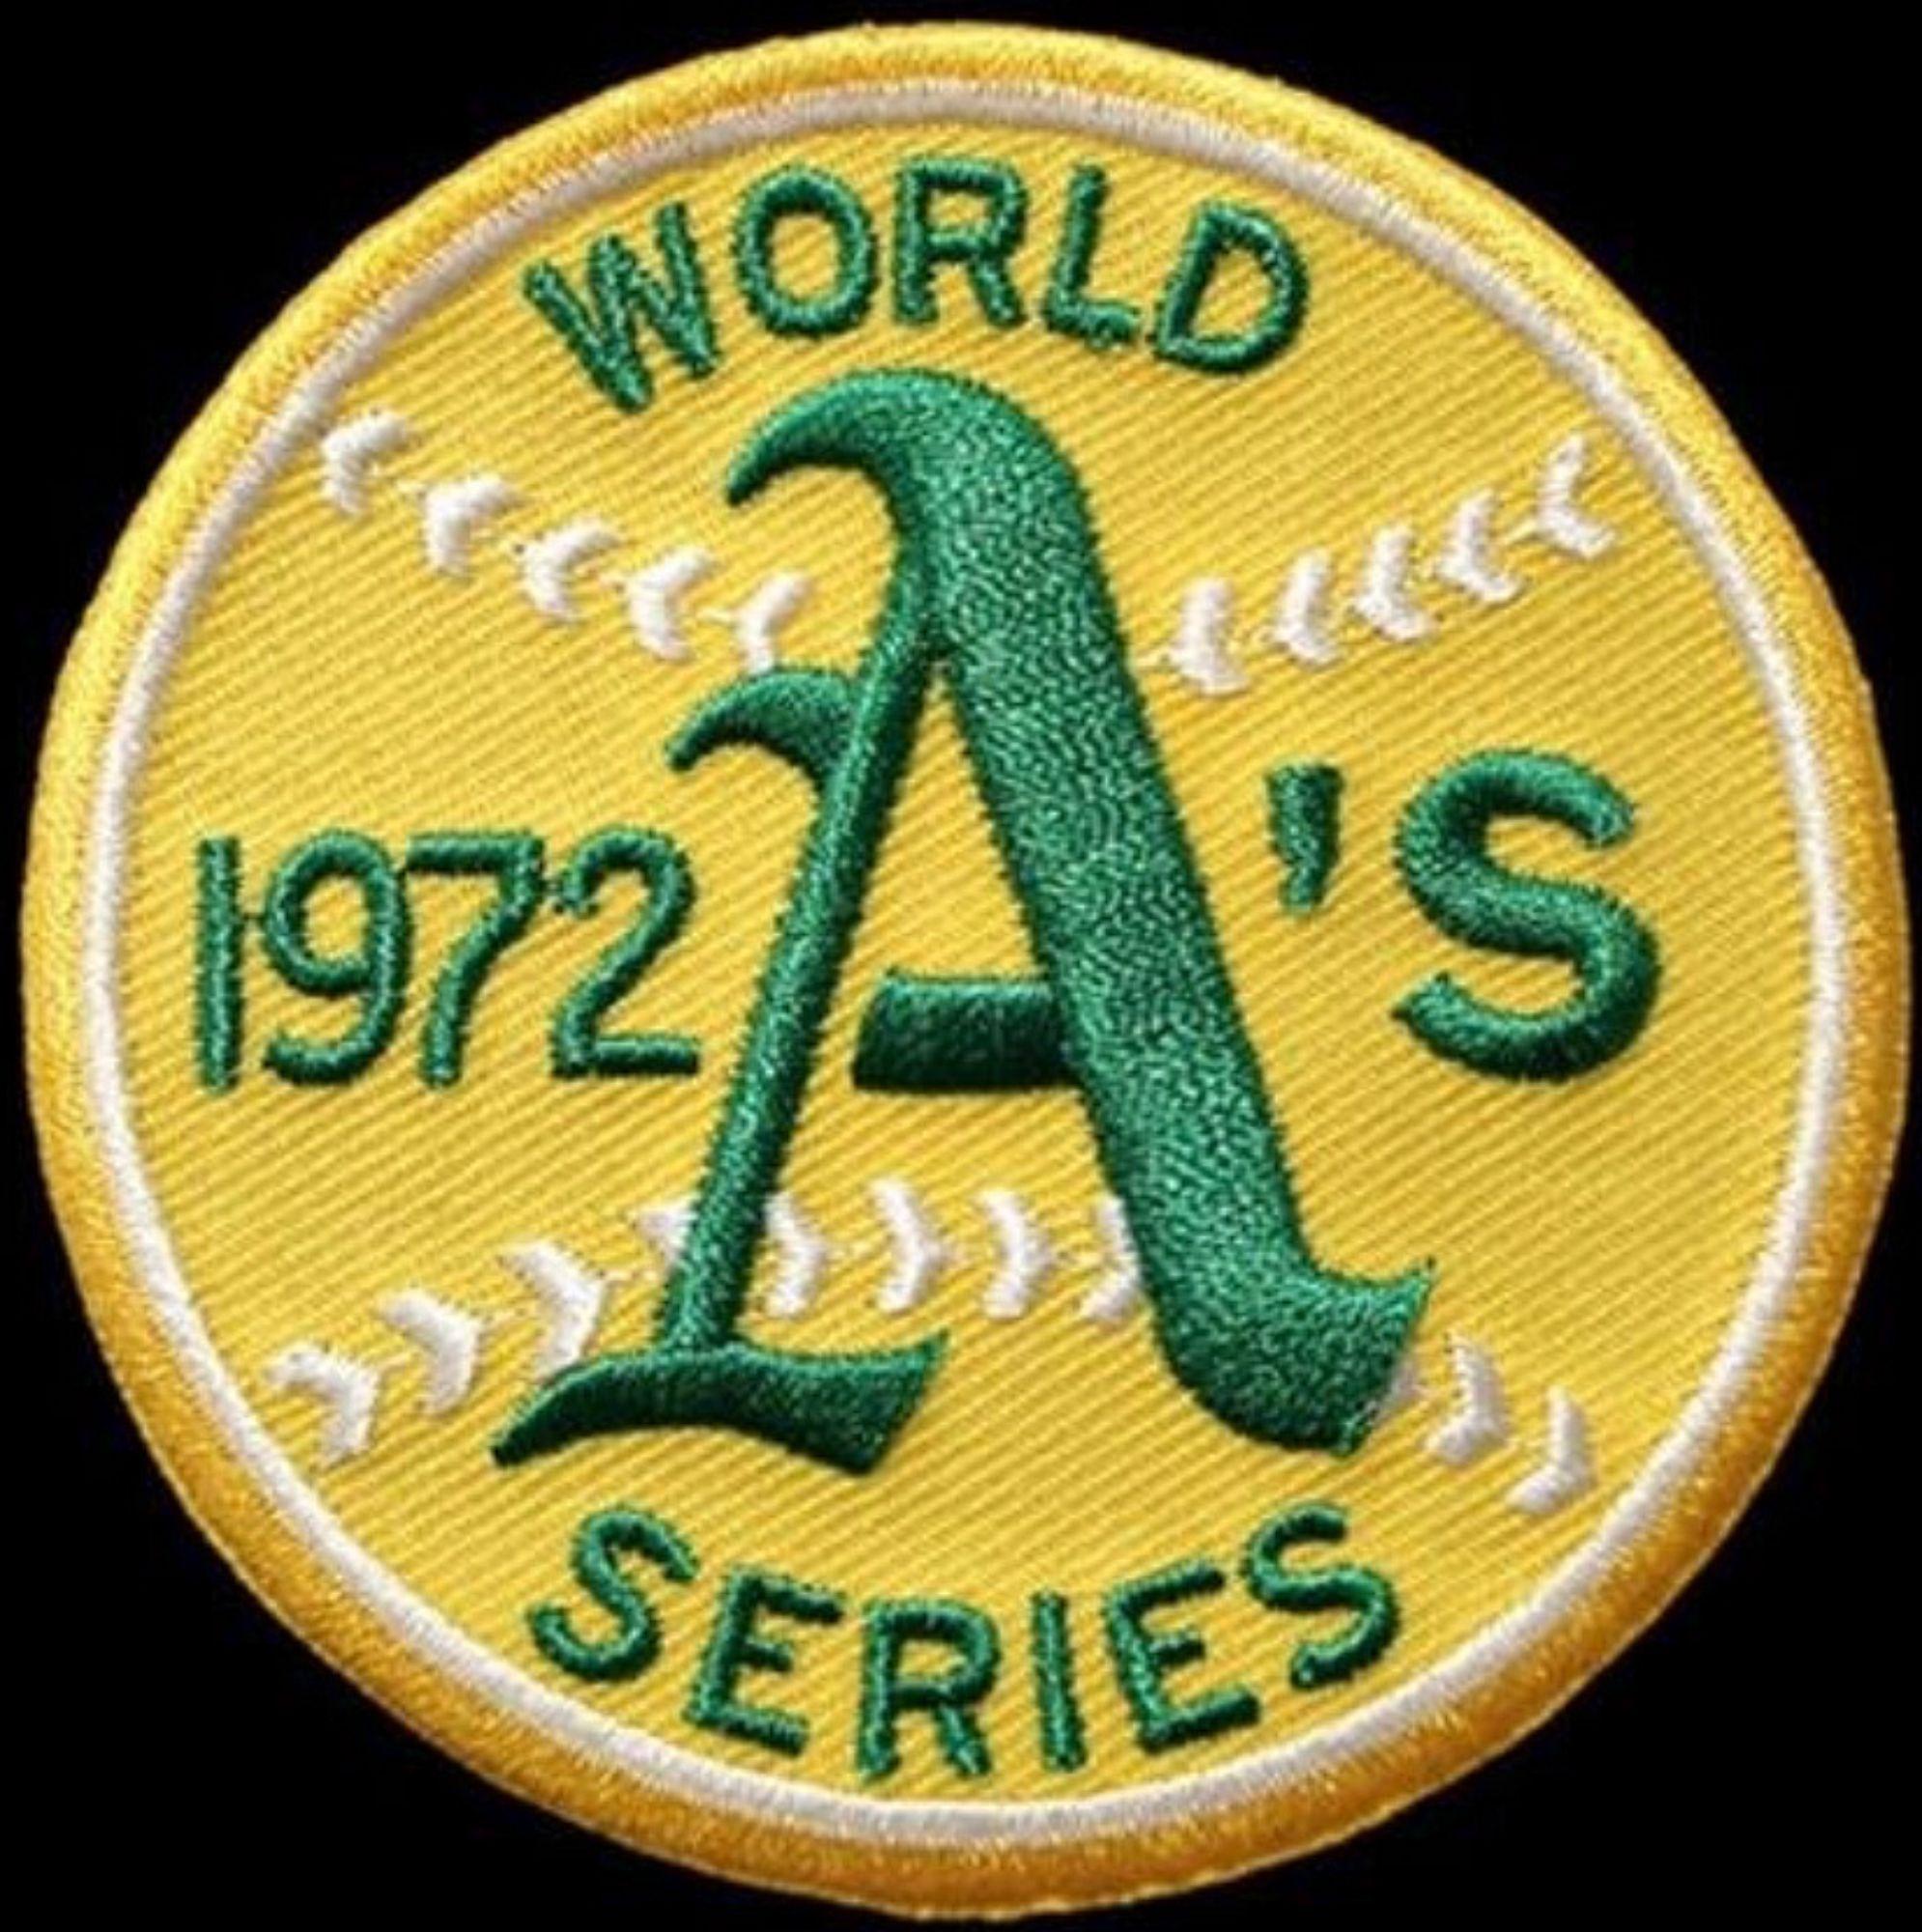 Oakland Athletics 1972 World Series Patch '